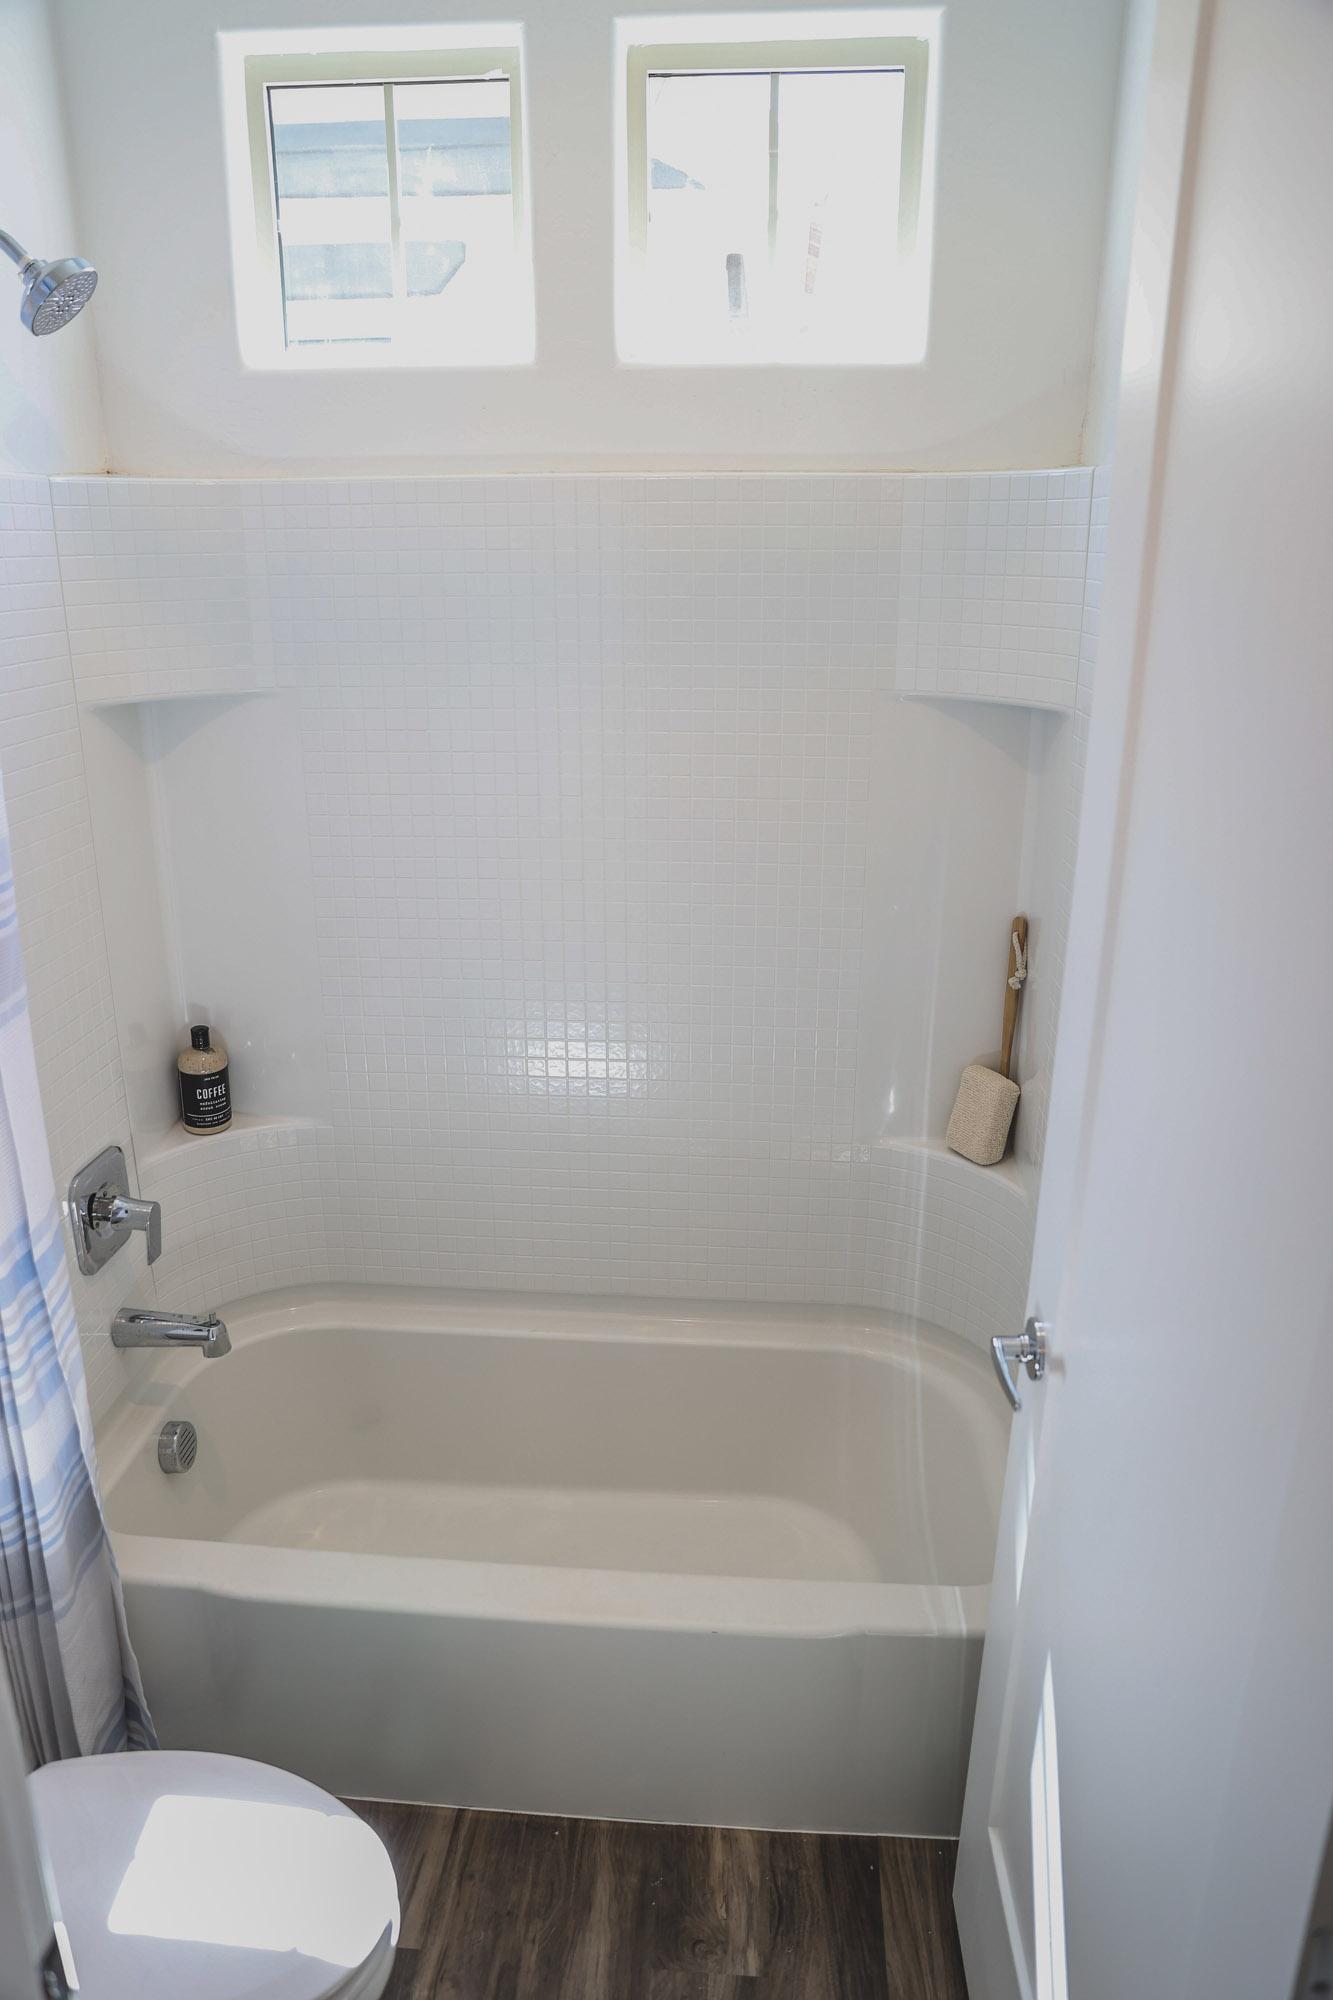 Tub and Shower Room at Village at Harvard Crossing Apartments in Goodyear, AZ